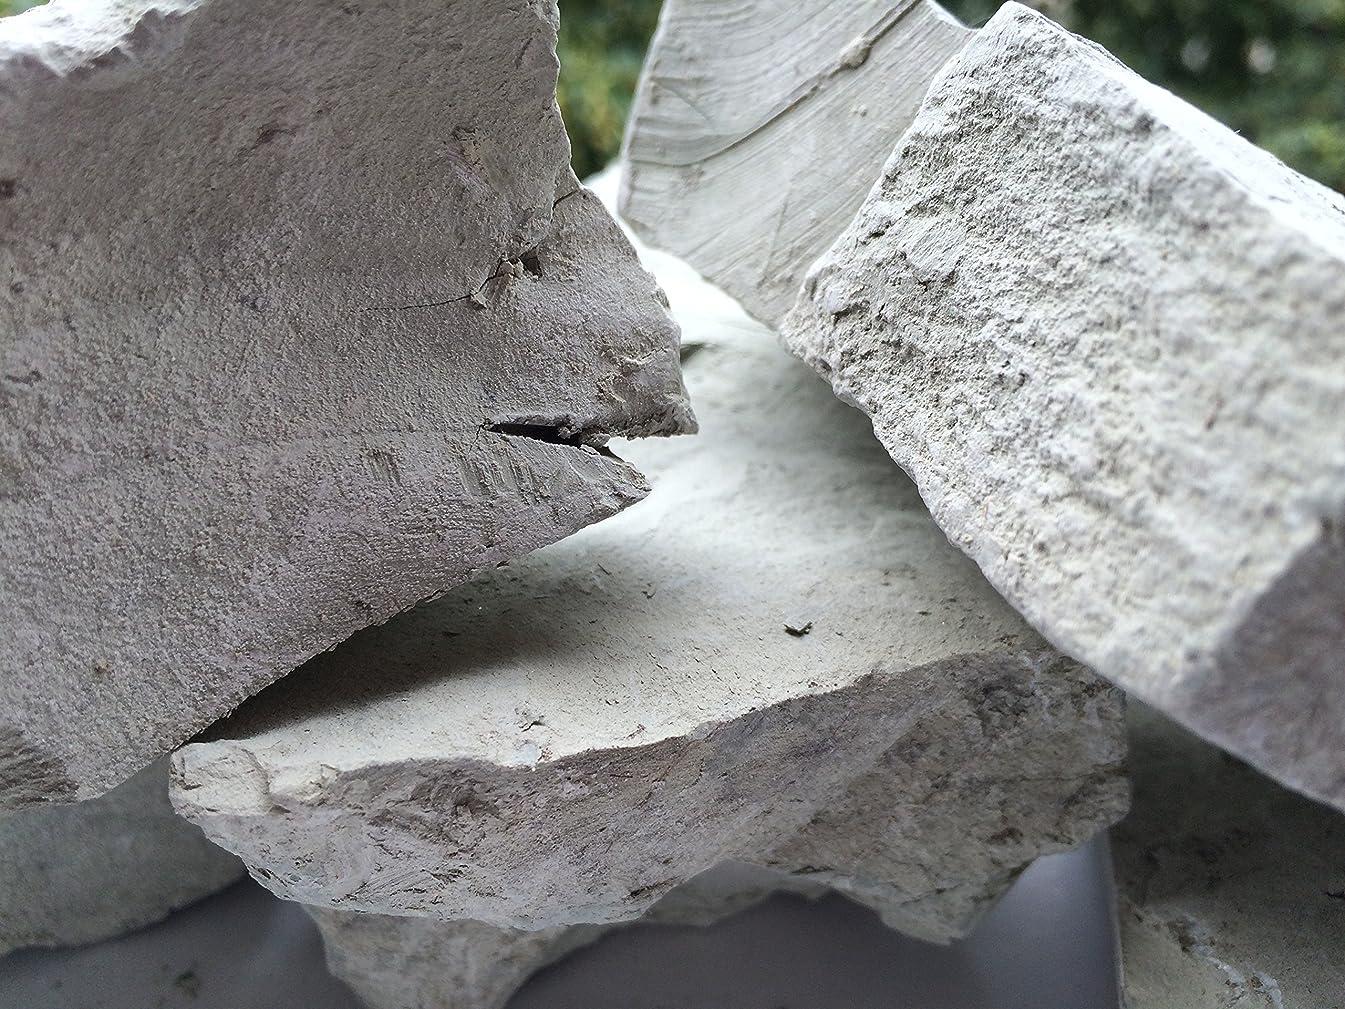 Sapphire Edible Clay Chunks (lump) Natural for Eating (Food), 1 lb (450 g)